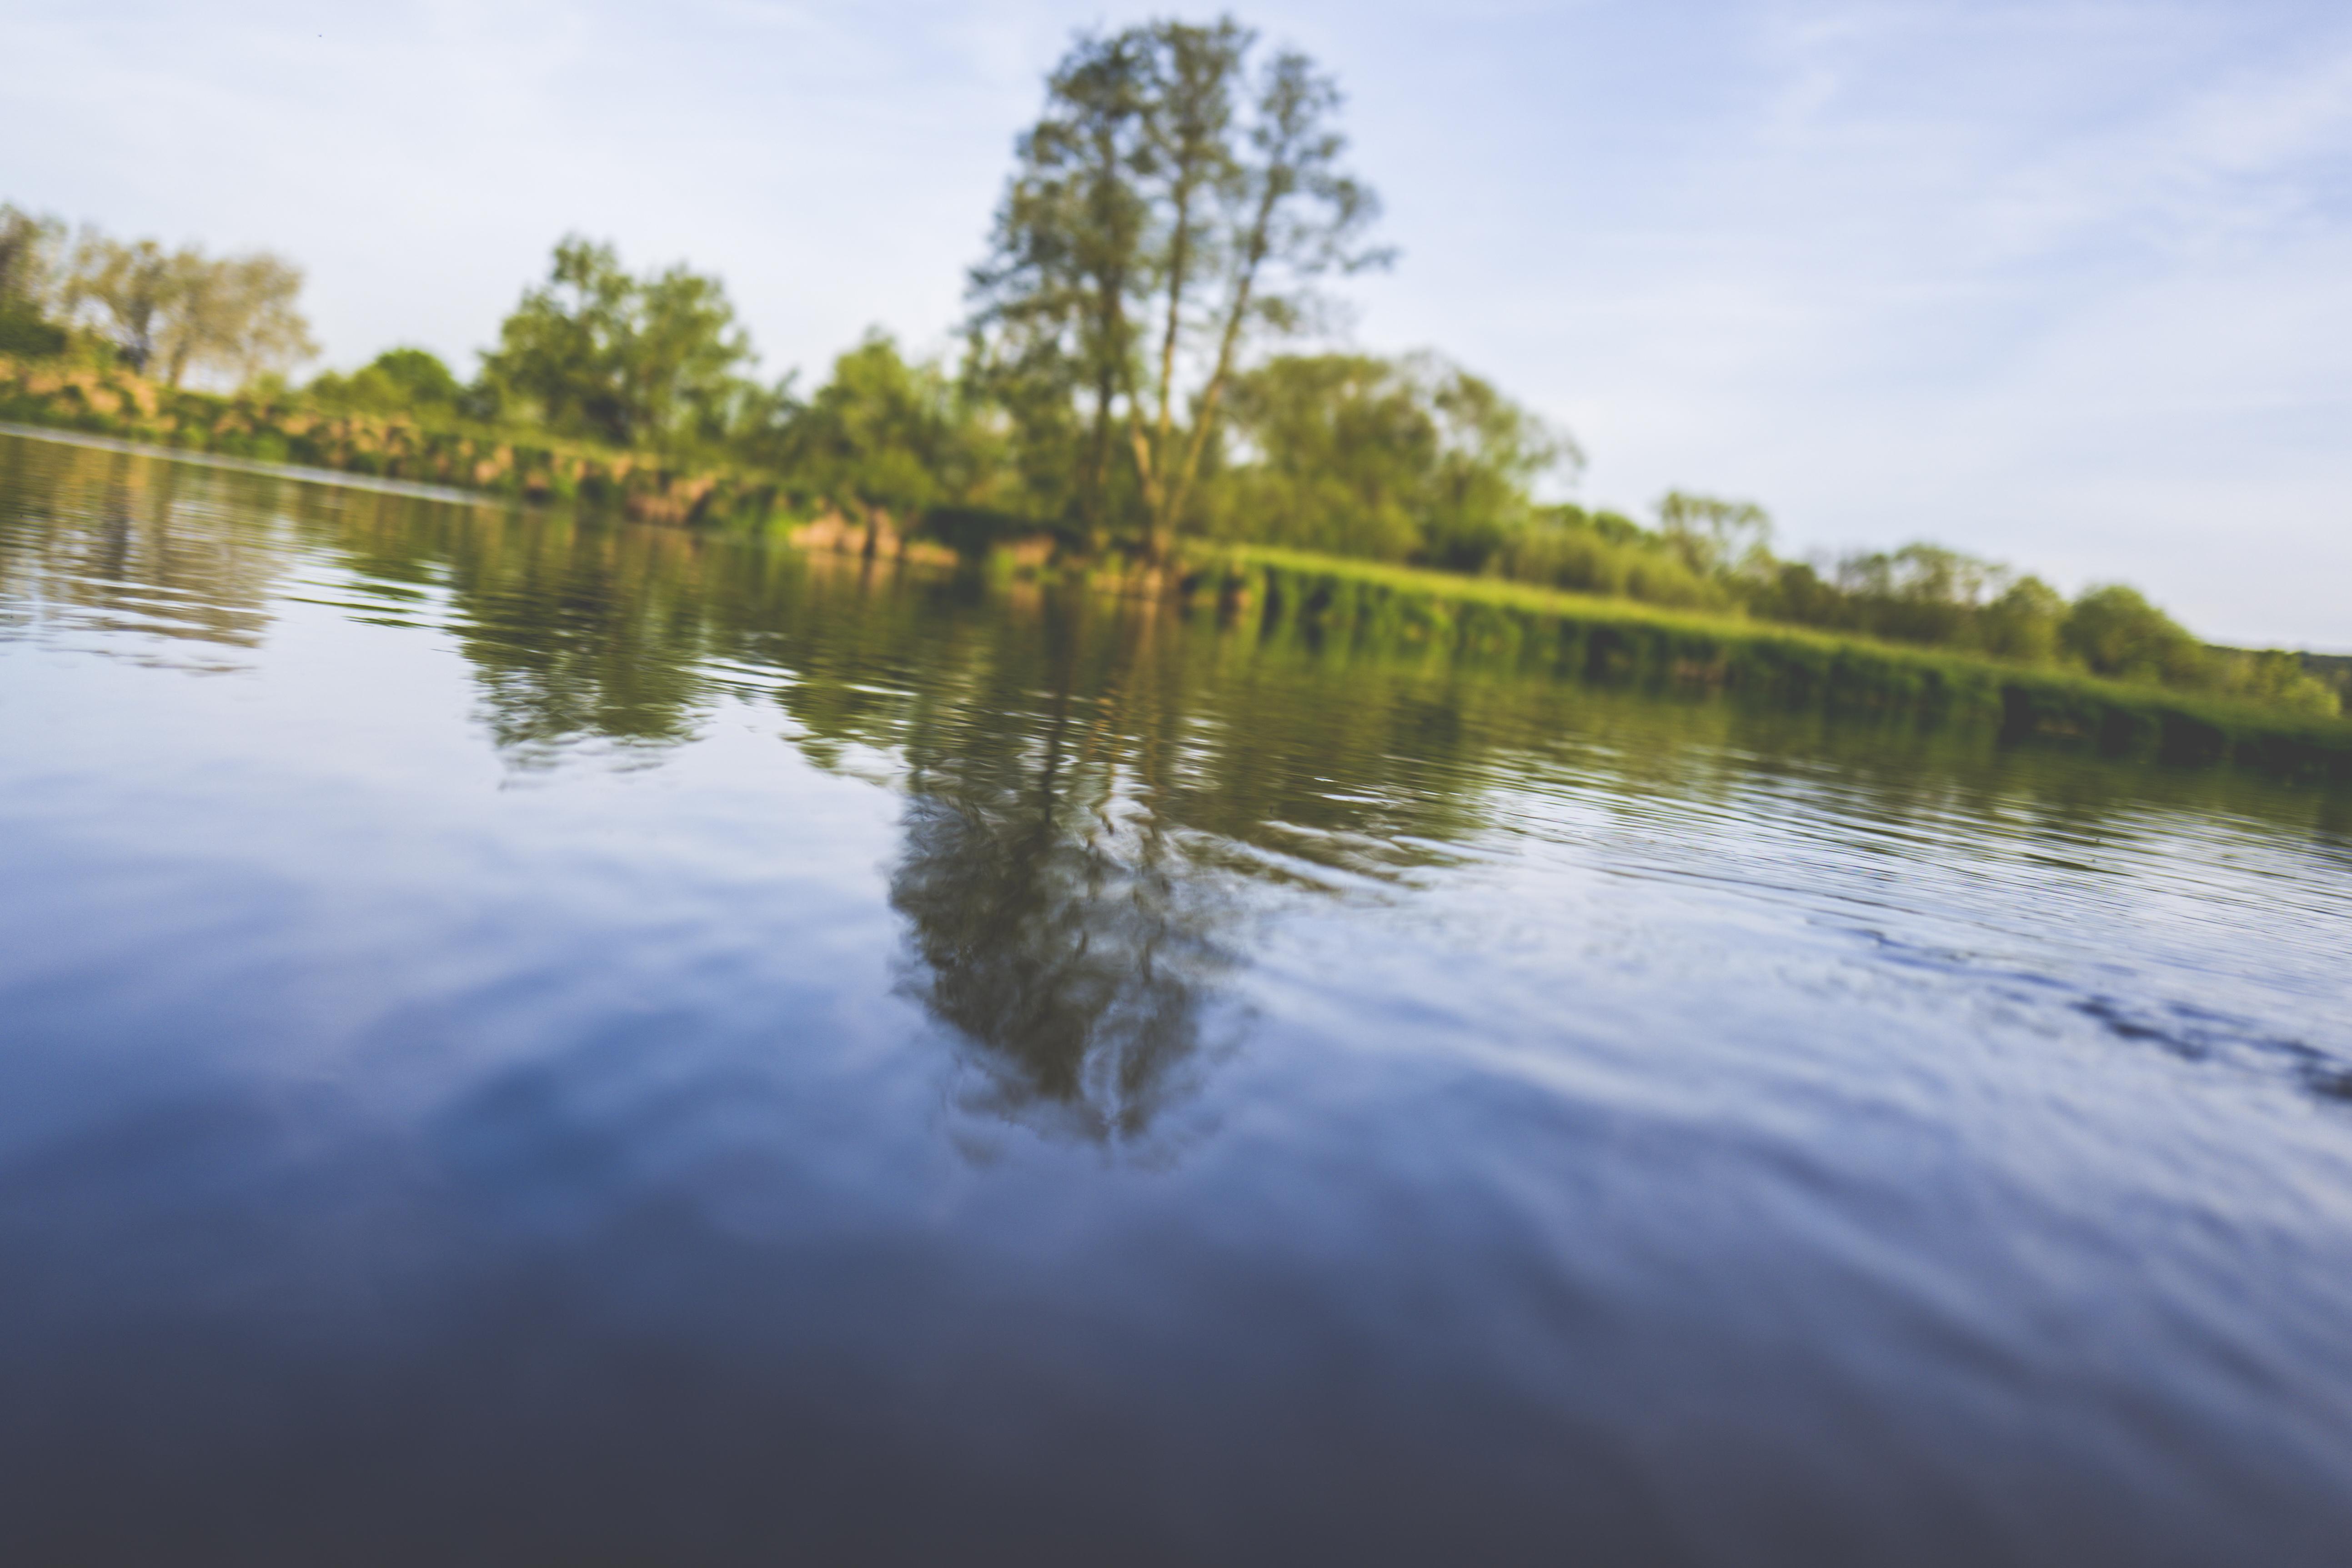 Free Images : landscape, tree, nature, lake, river, europe, green